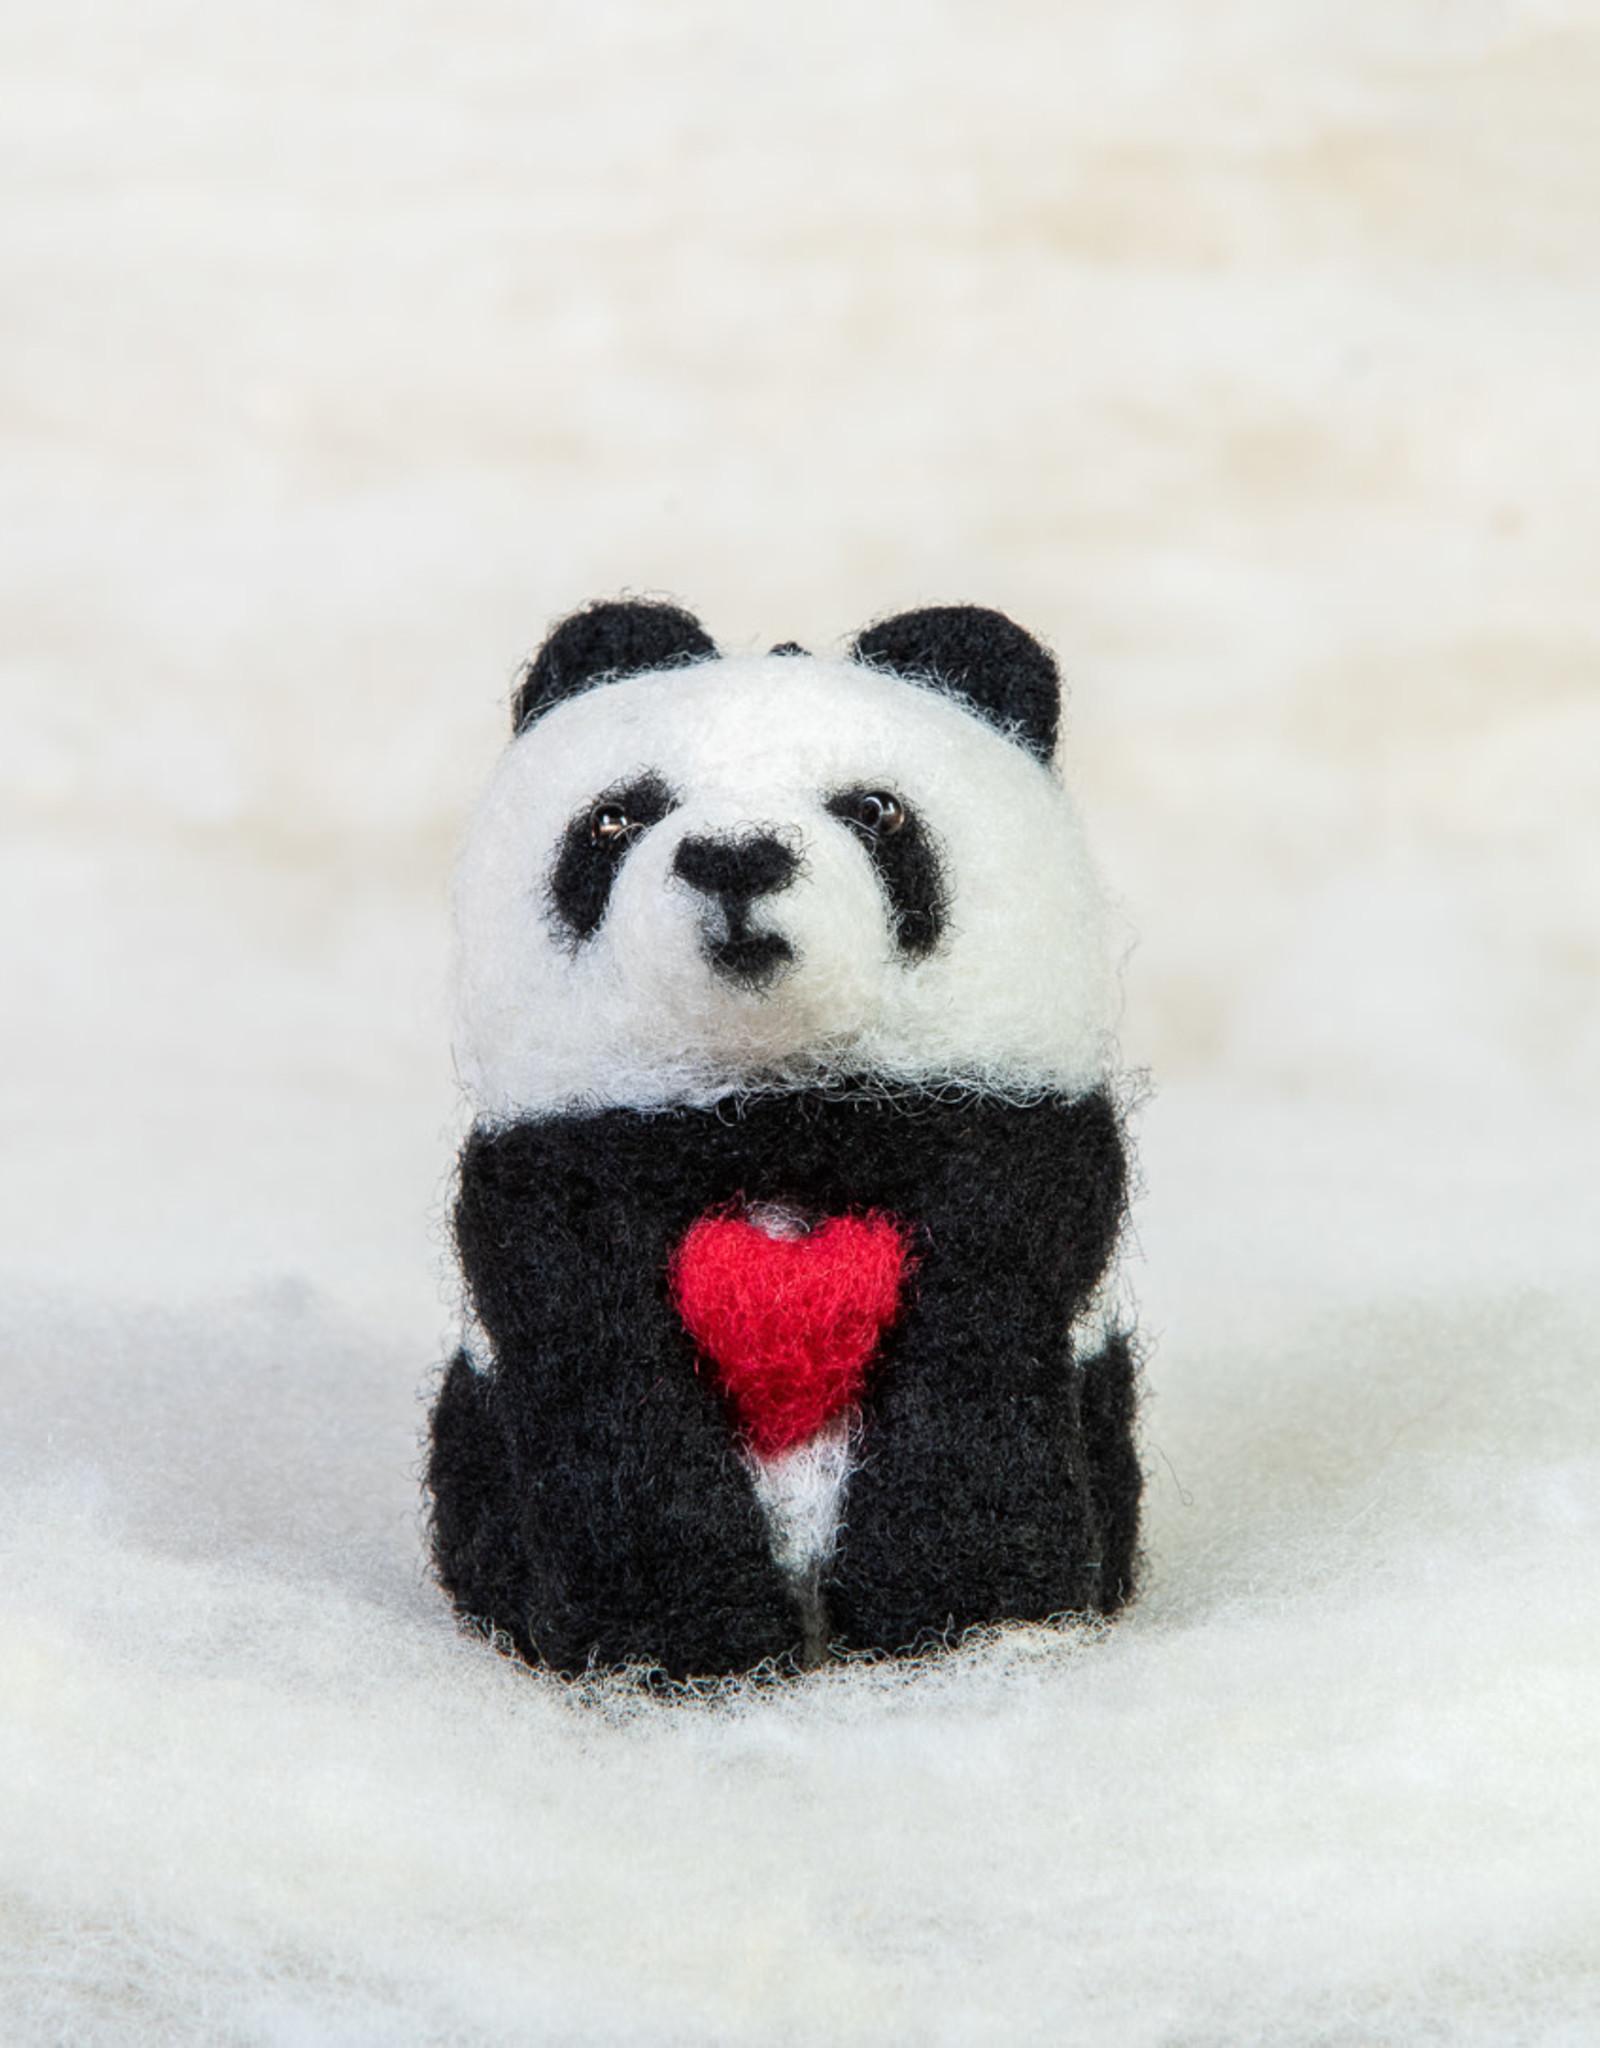 Spectacled Bear Panda Bear with Heart